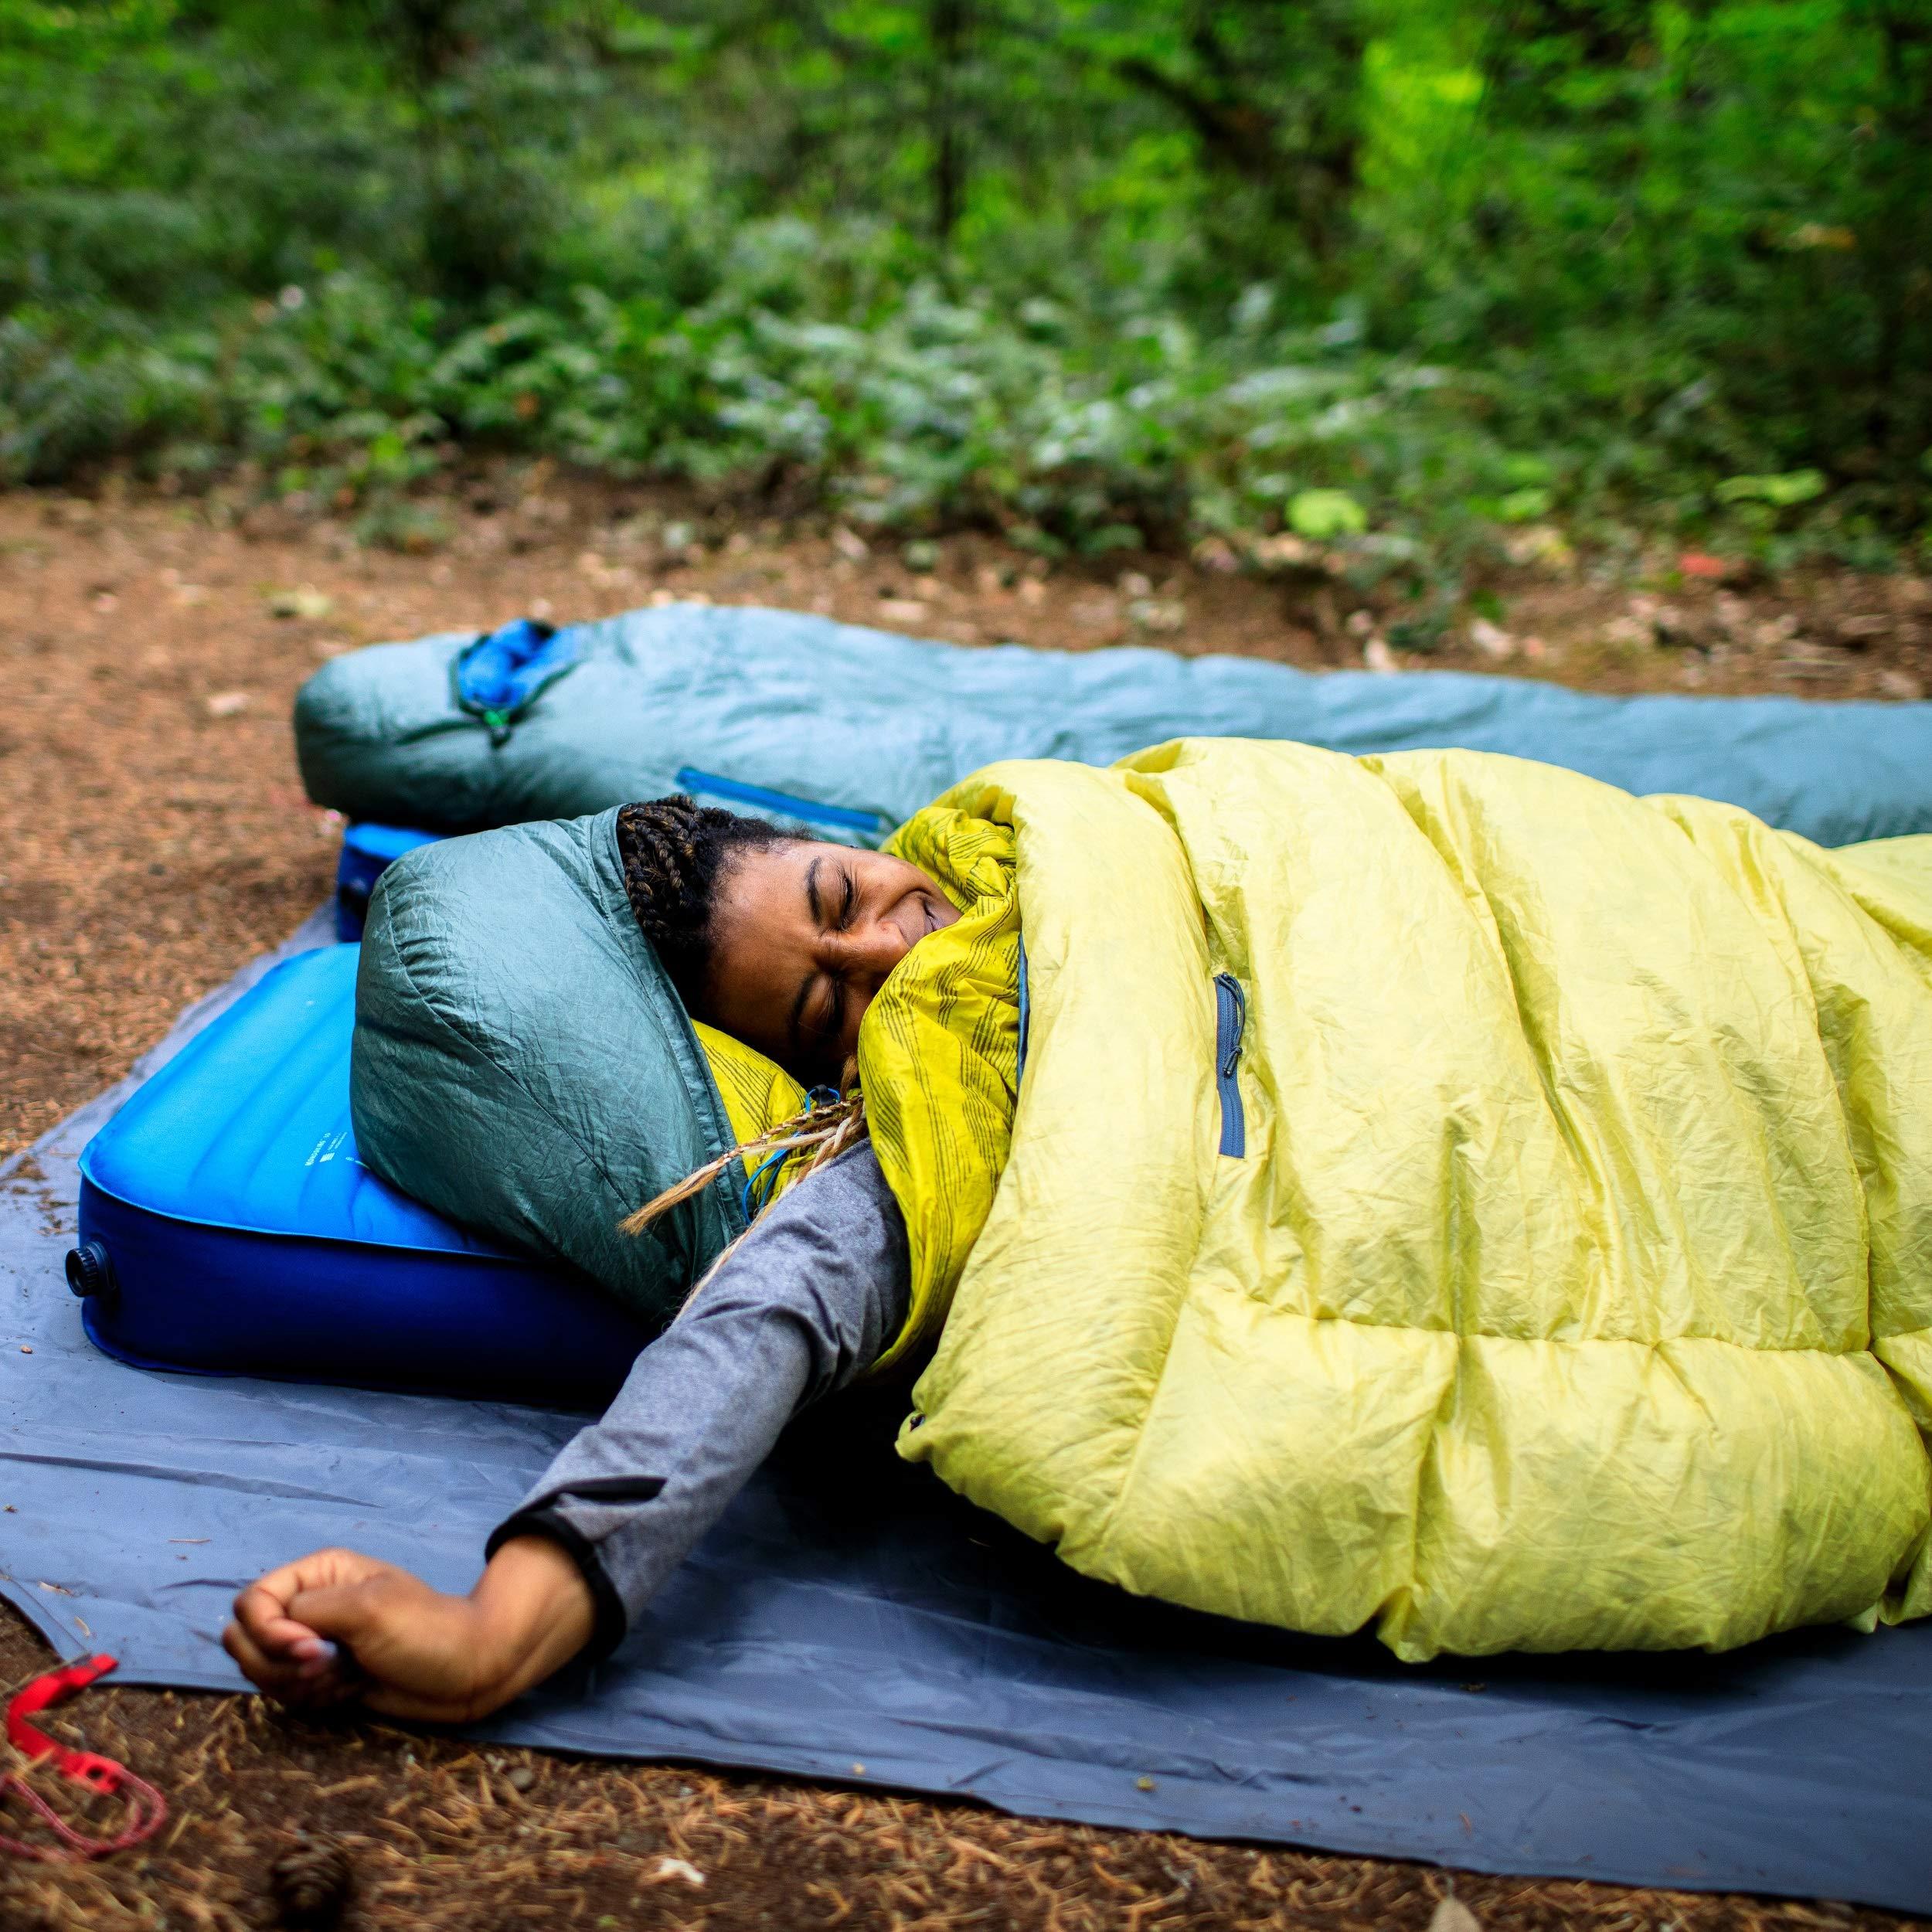 Therm-a-Rest MondoKing 3D Self-Inflating Foam Camping Mattress